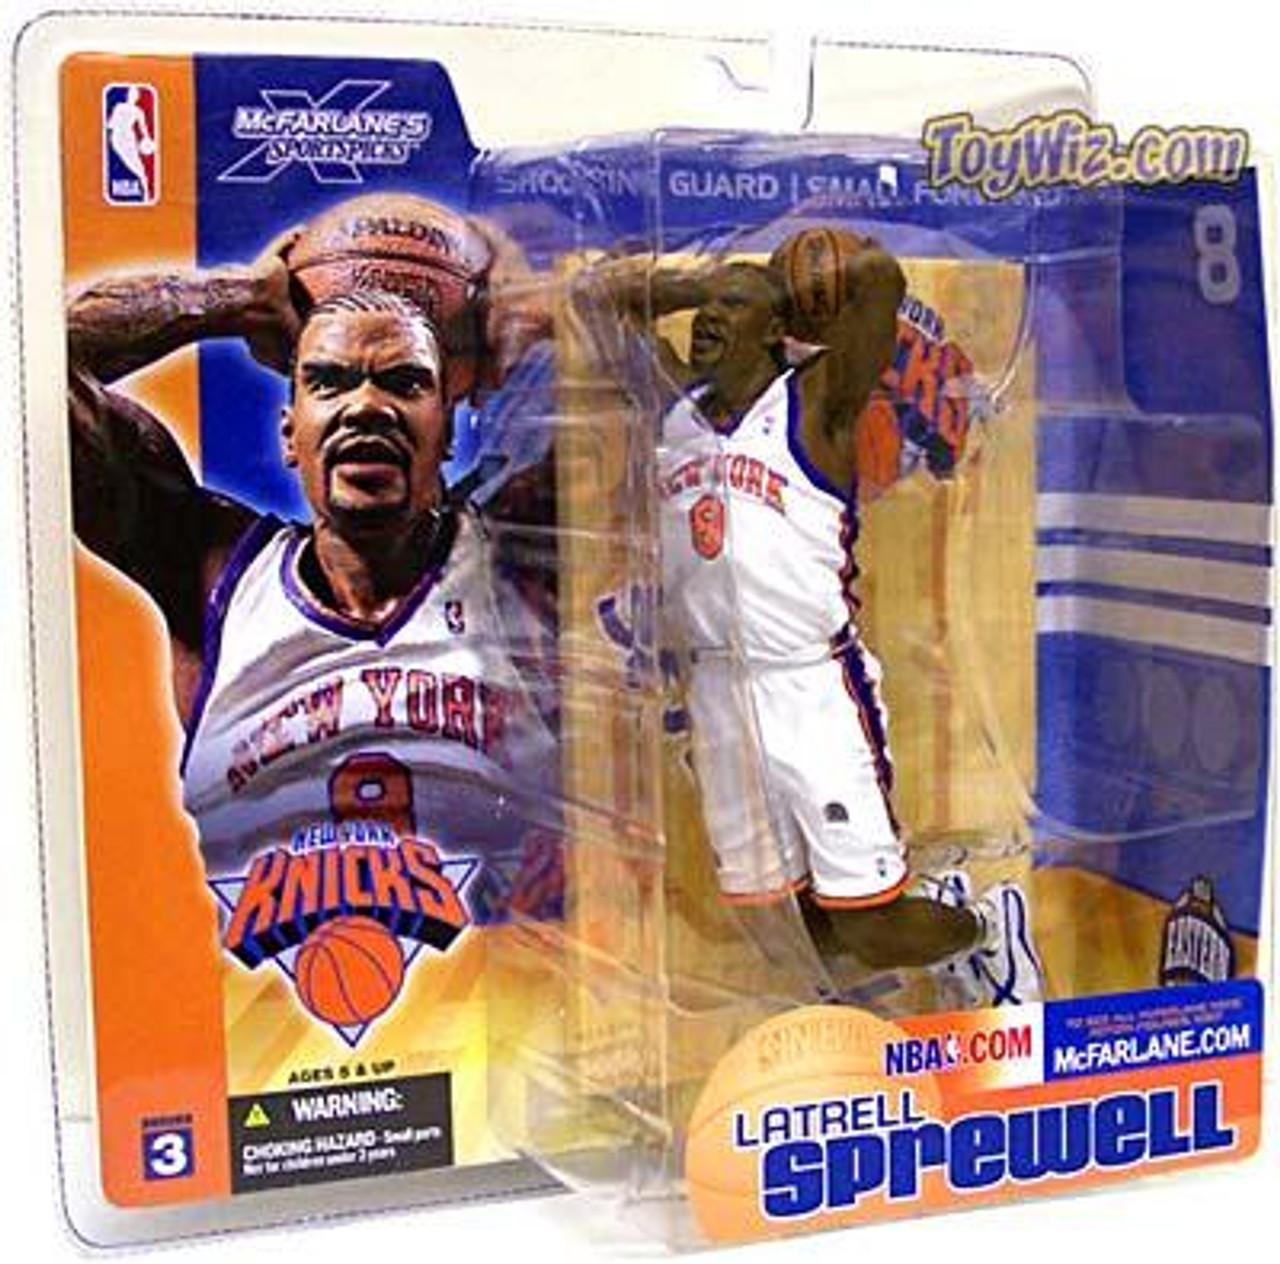 McFarlane Toys NBA New York Knicks Sports Picks Series 3 Latrell Sprewell Action Figure [White Jersey]